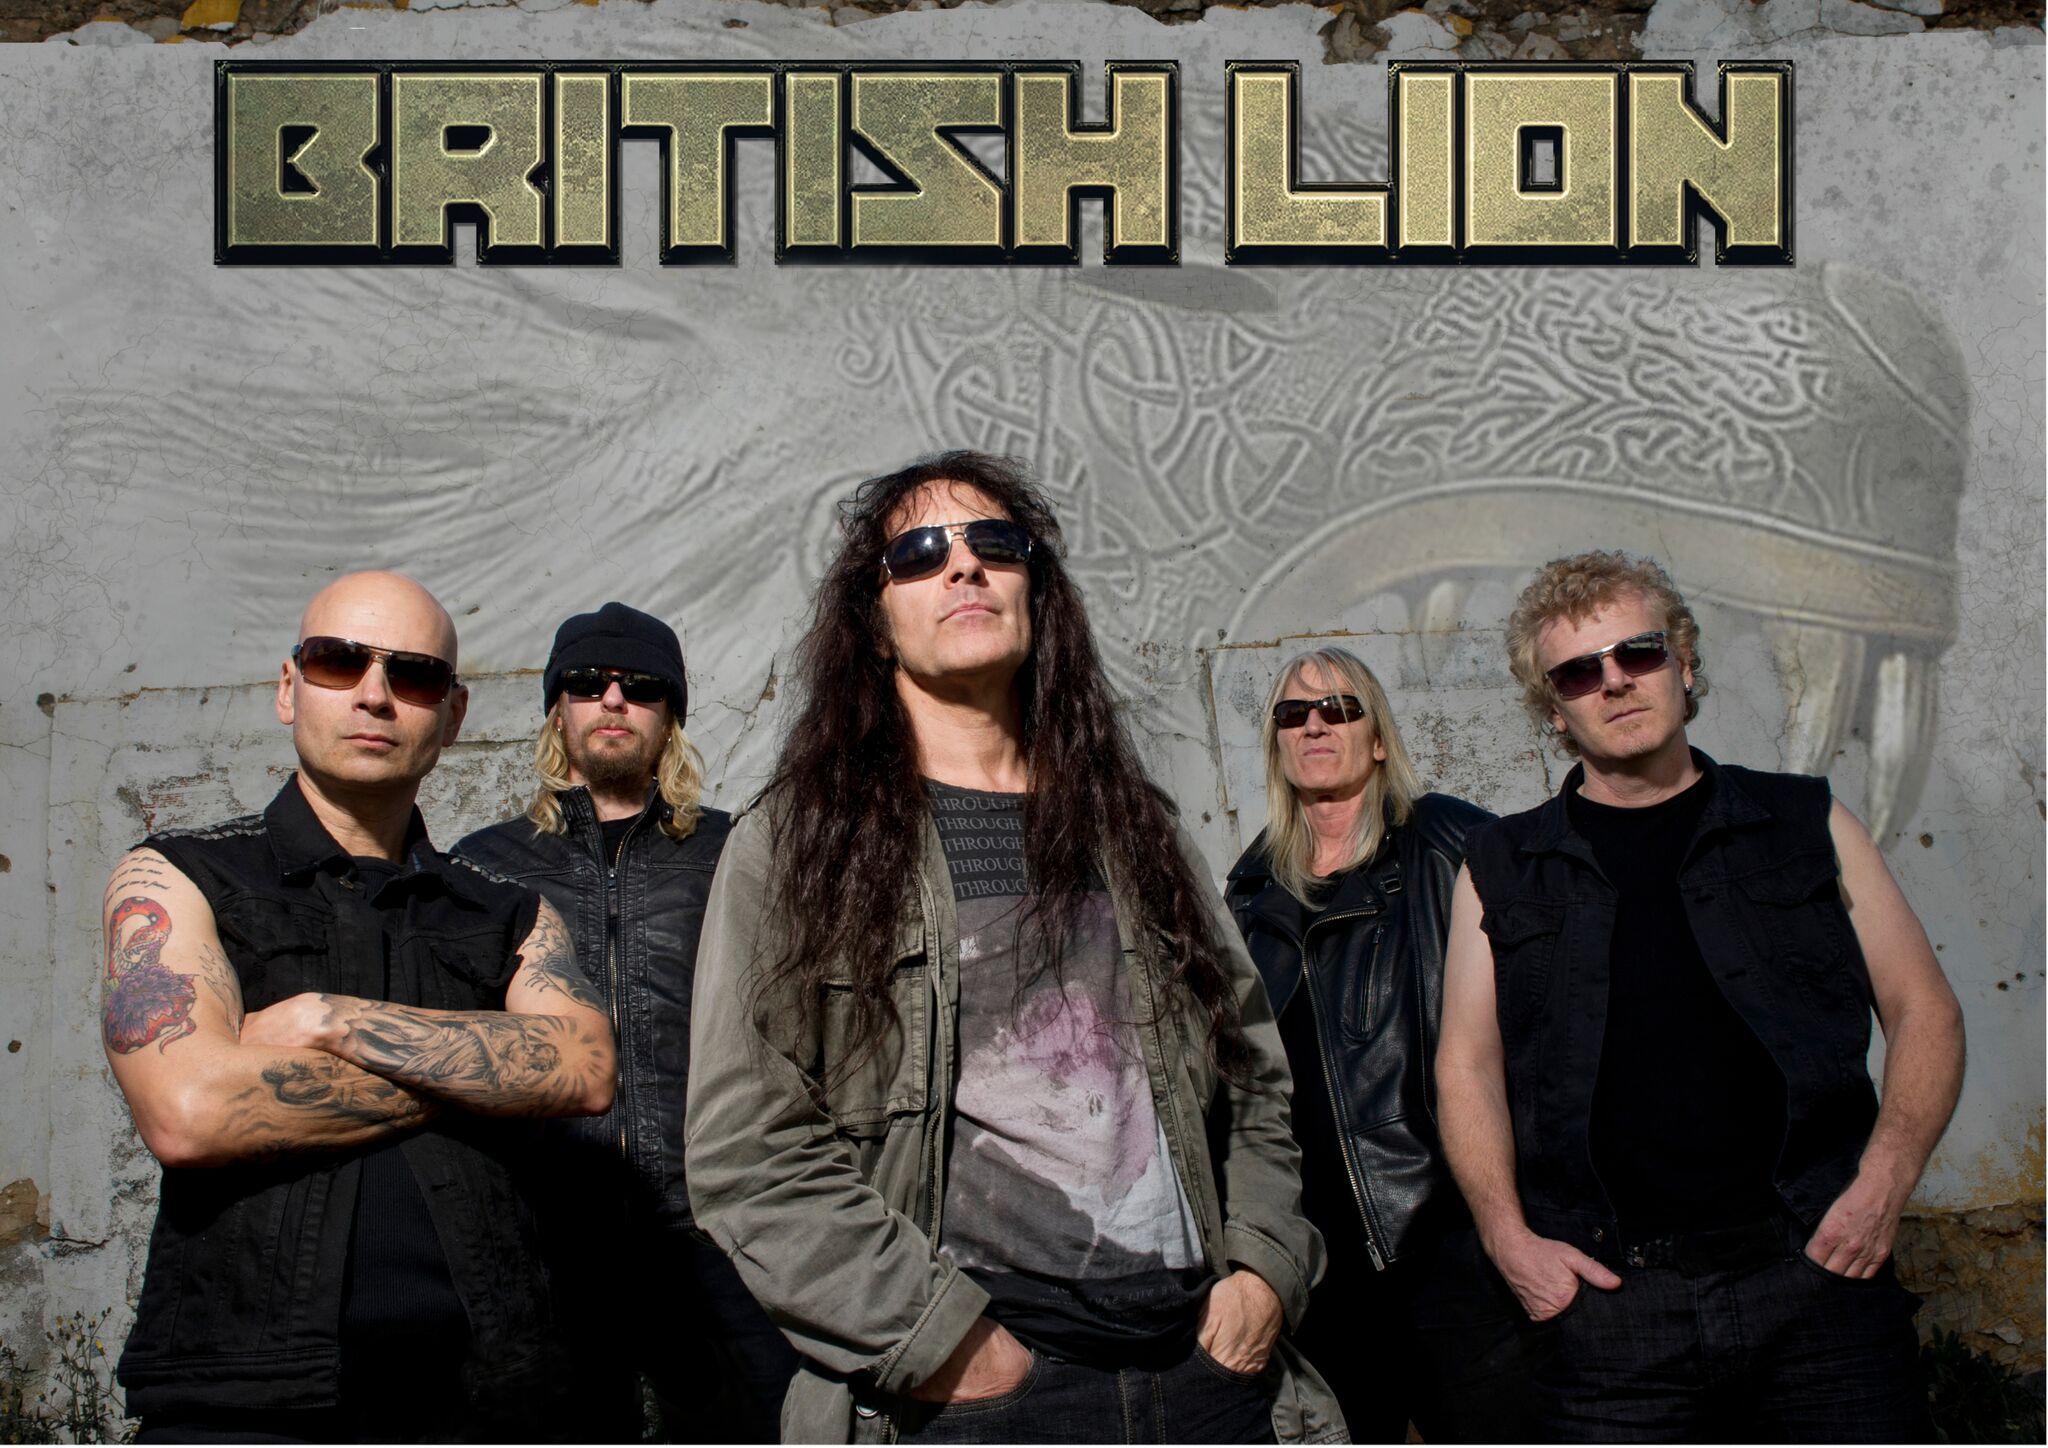 british-lion-logo